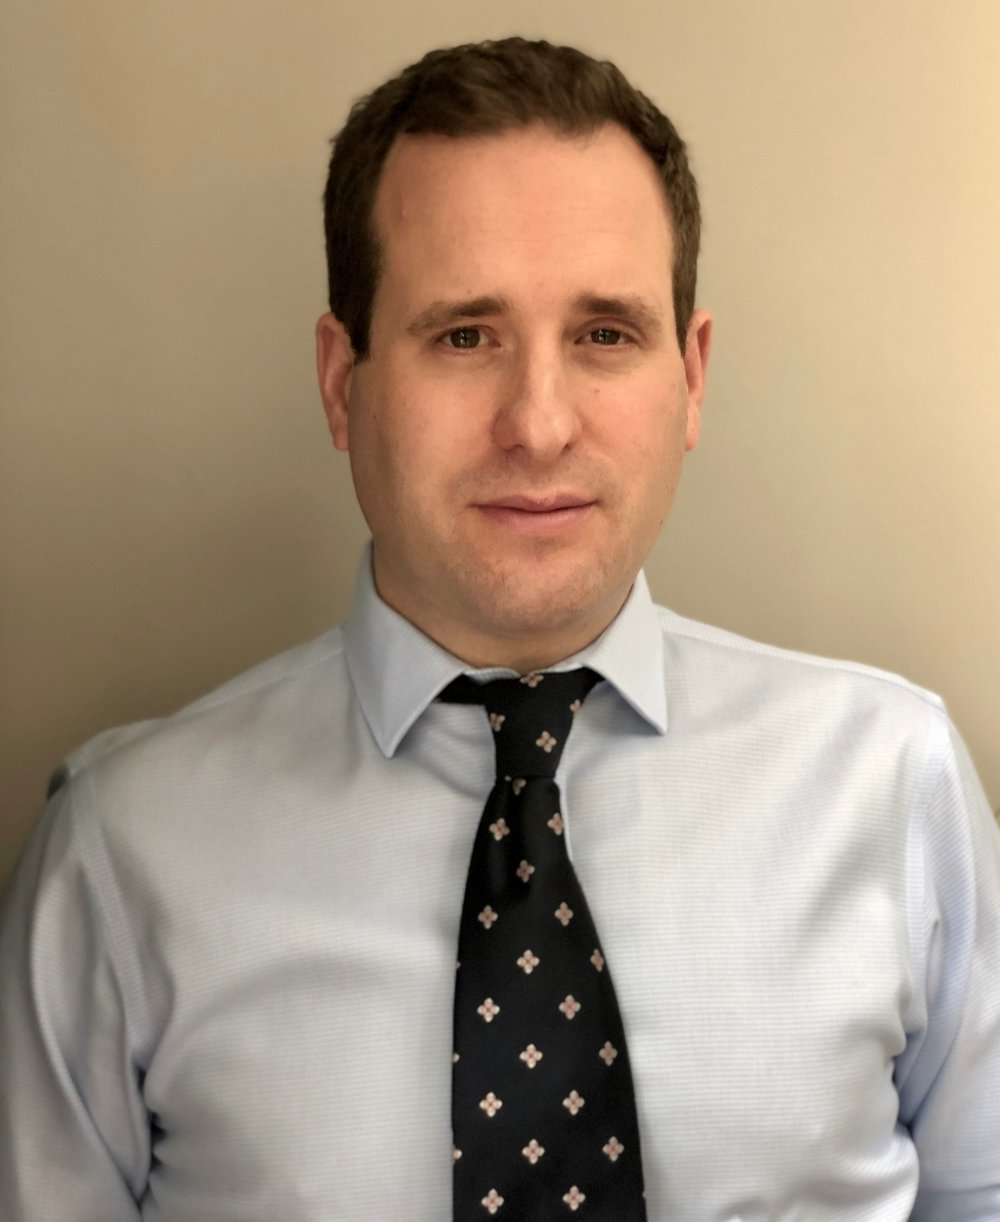 Dr Ben esdaile Consultant dermatologist